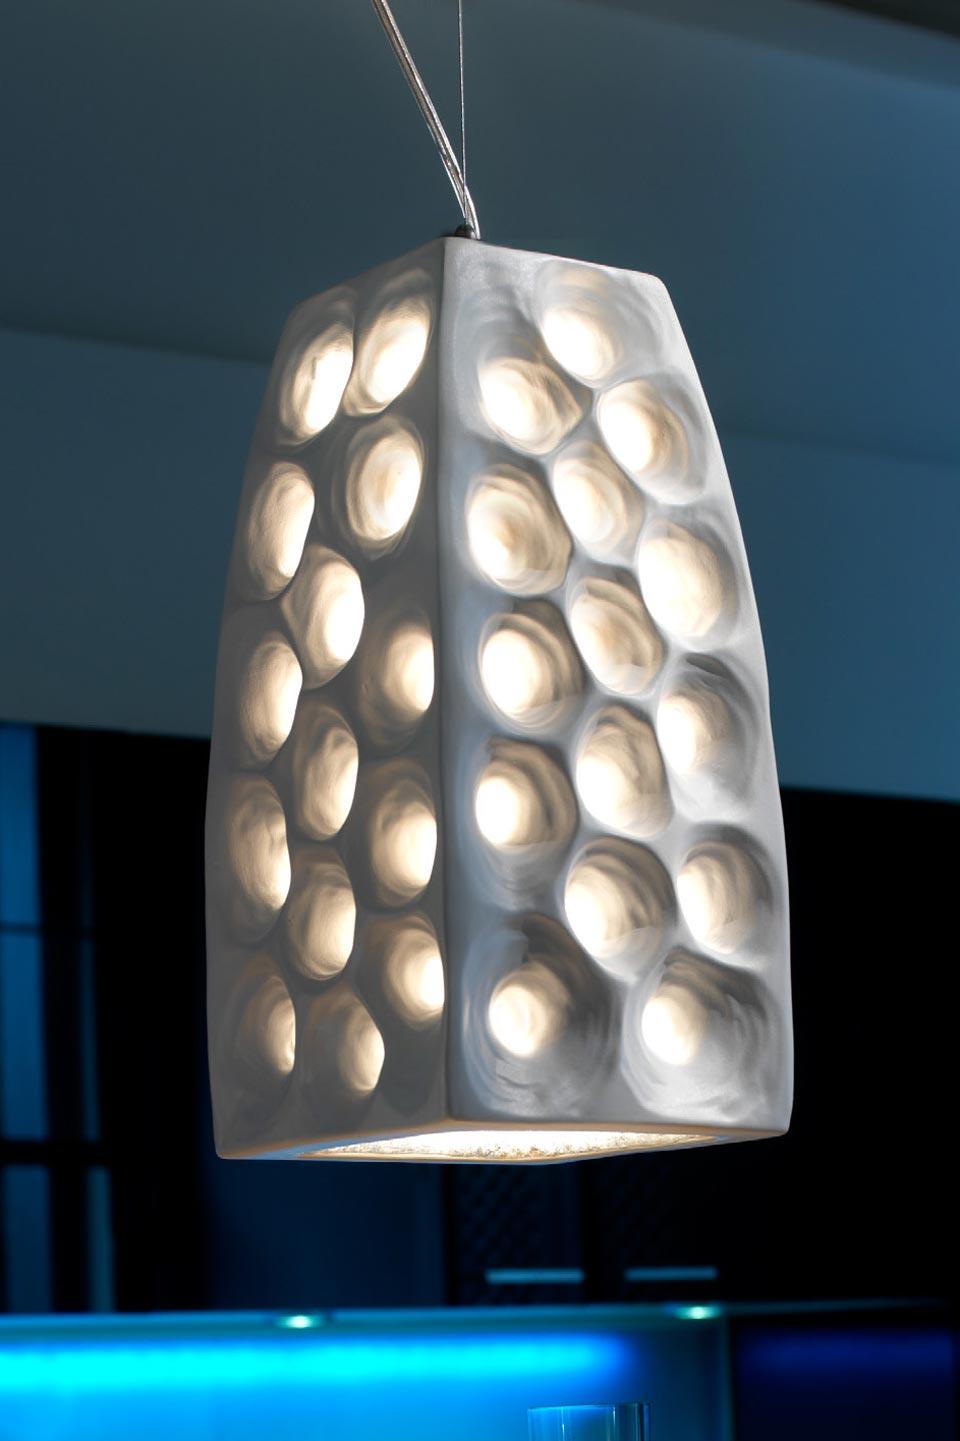 suspensions design ceramique blanche accueil design et. Black Bedroom Furniture Sets. Home Design Ideas